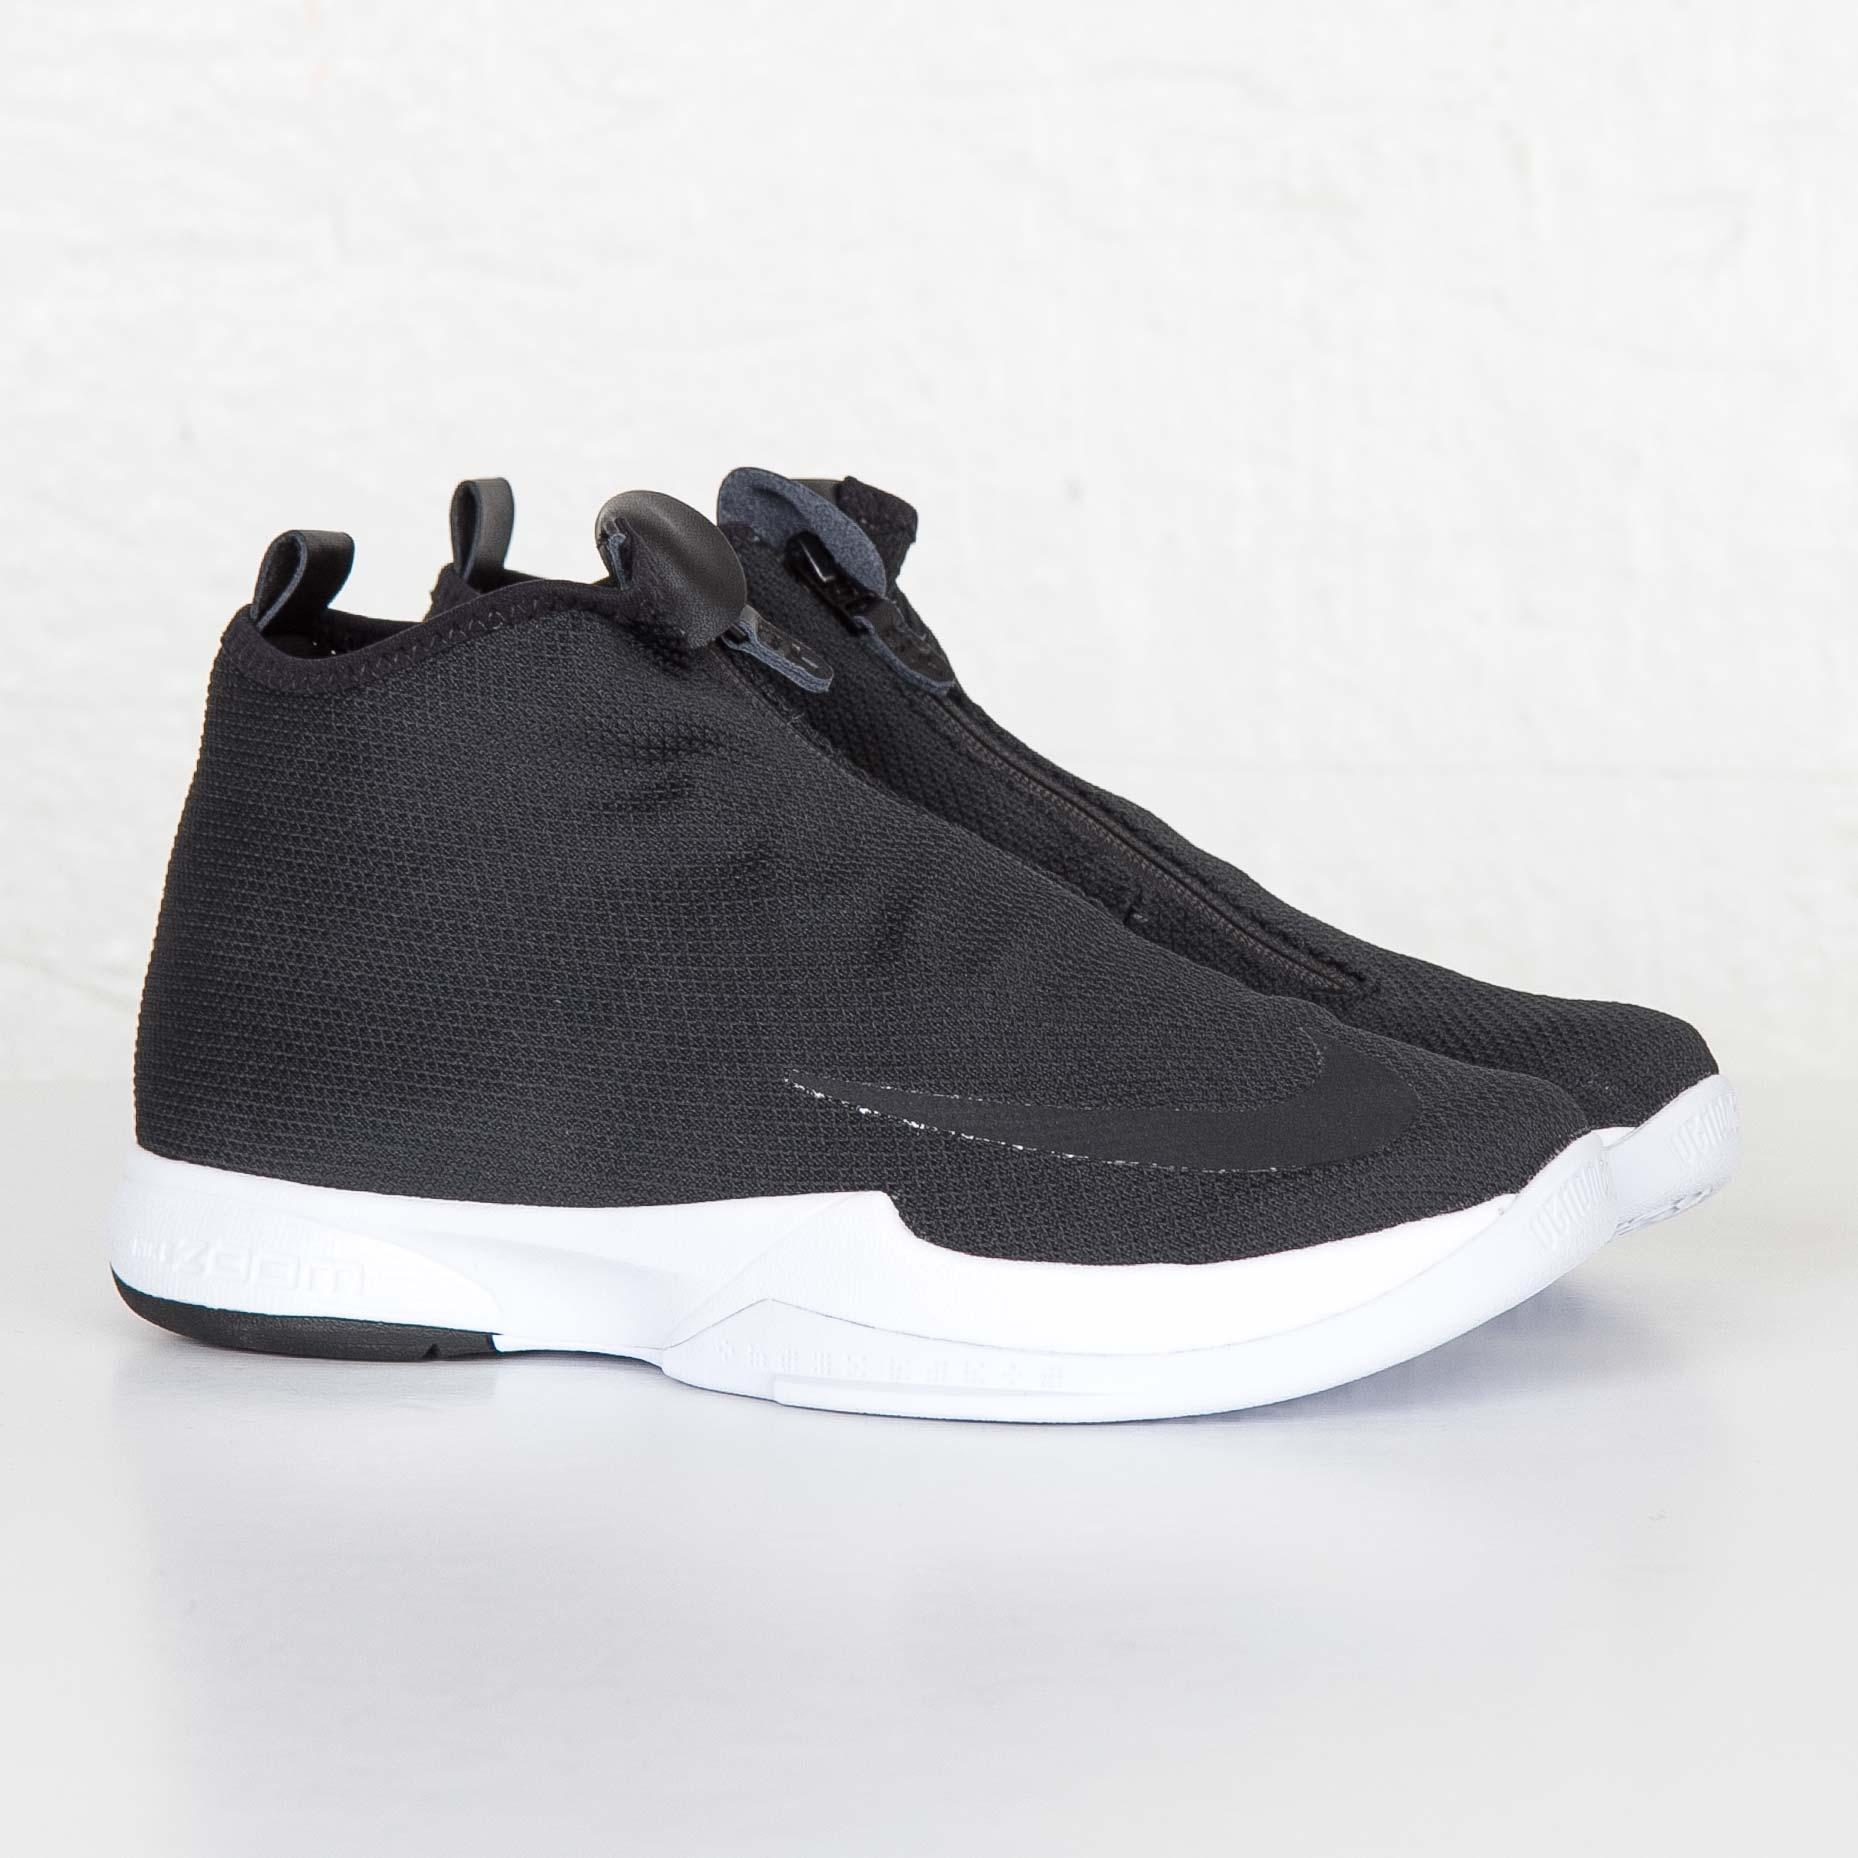 749c1a8f1f03 Nike Zoom Kobe Icon - 818583-001 - Sneakersnstuff